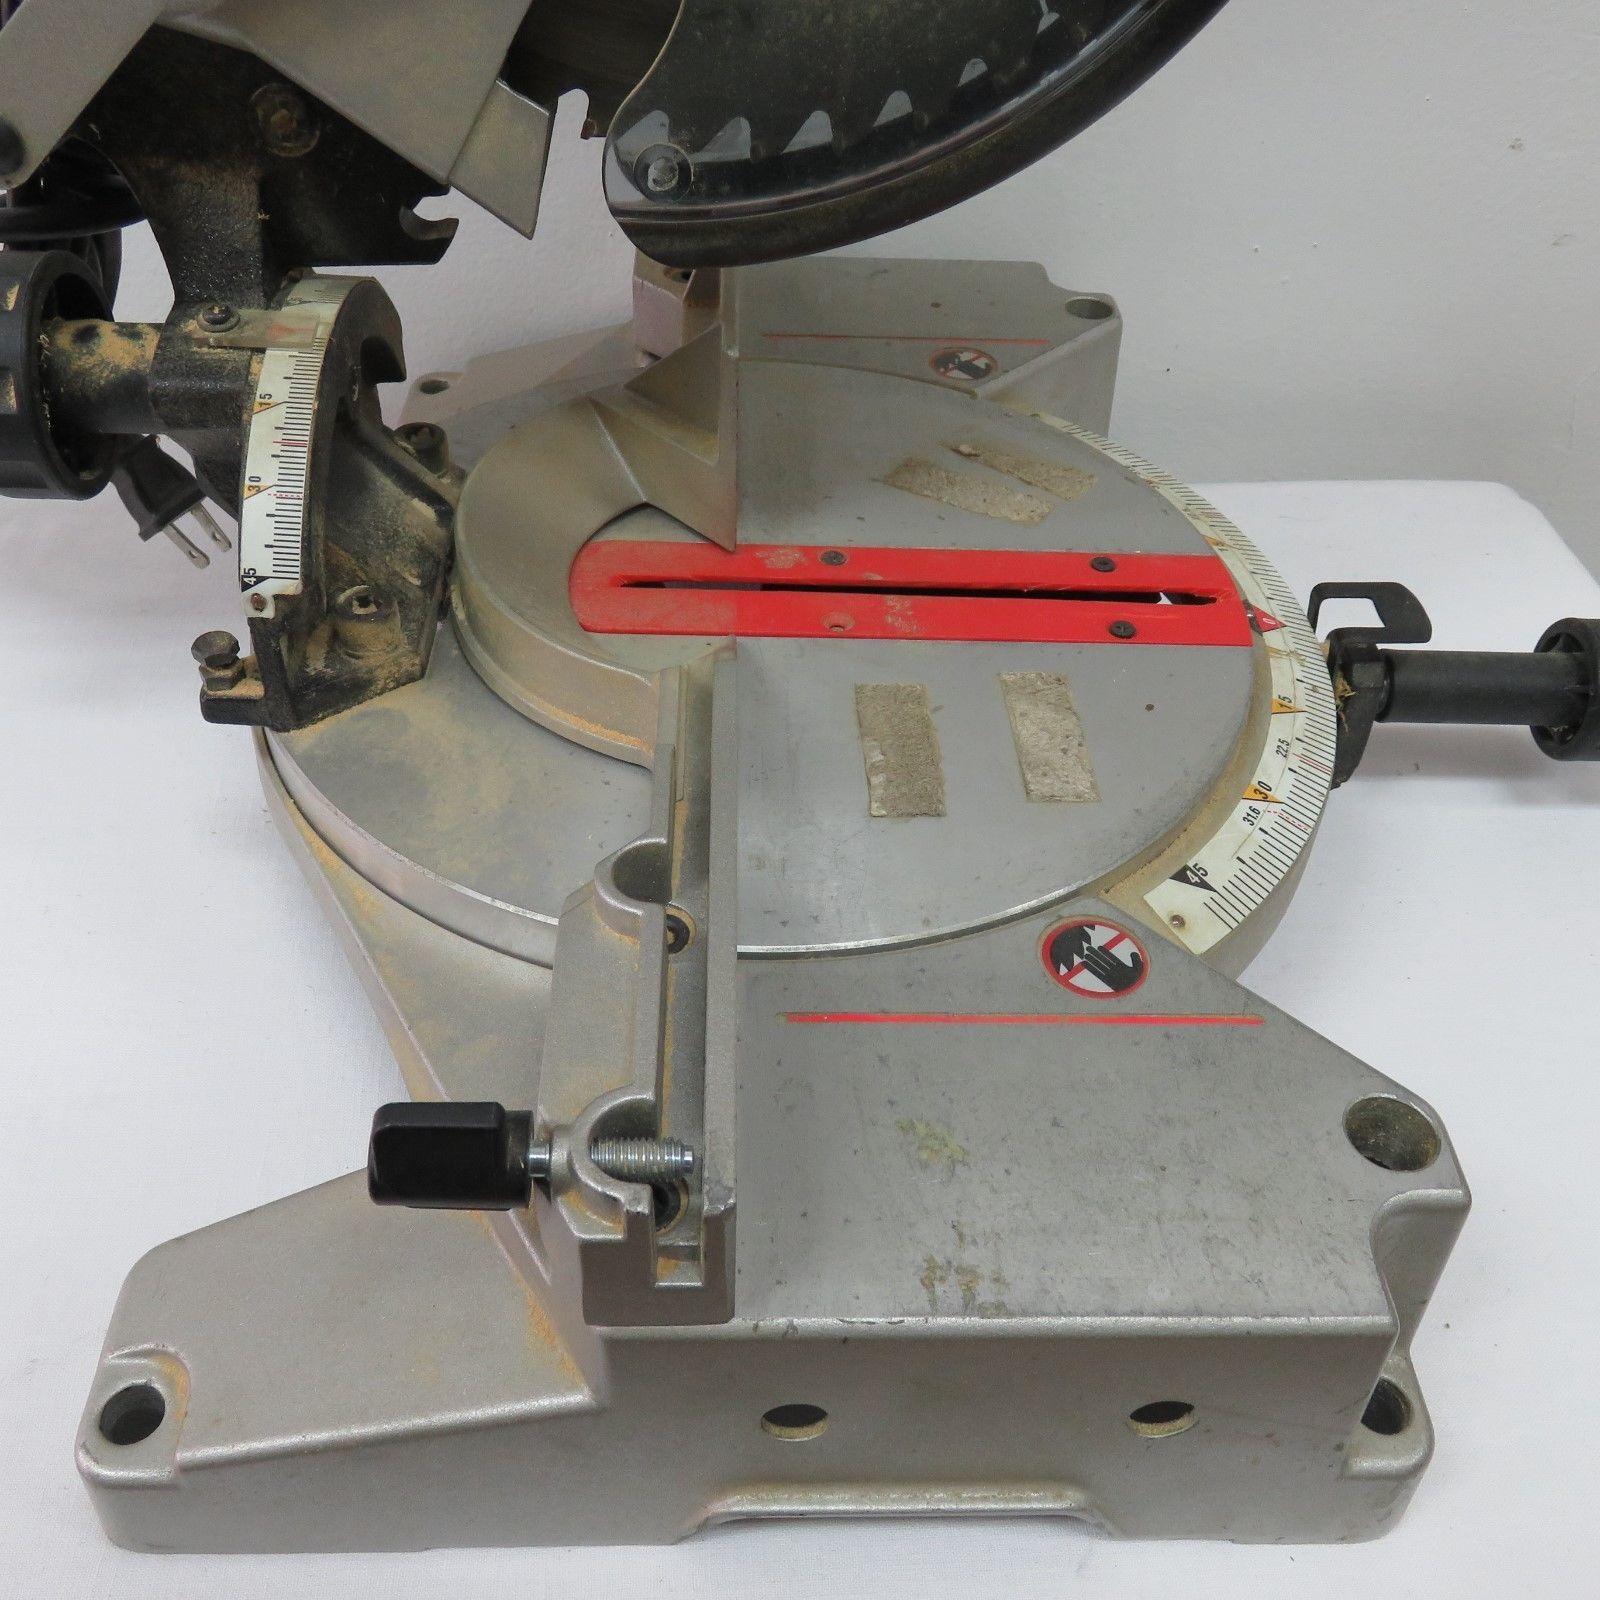 Craftsman Compound Miter Saw Parts Wiring Diagram 10 In Model 315243150